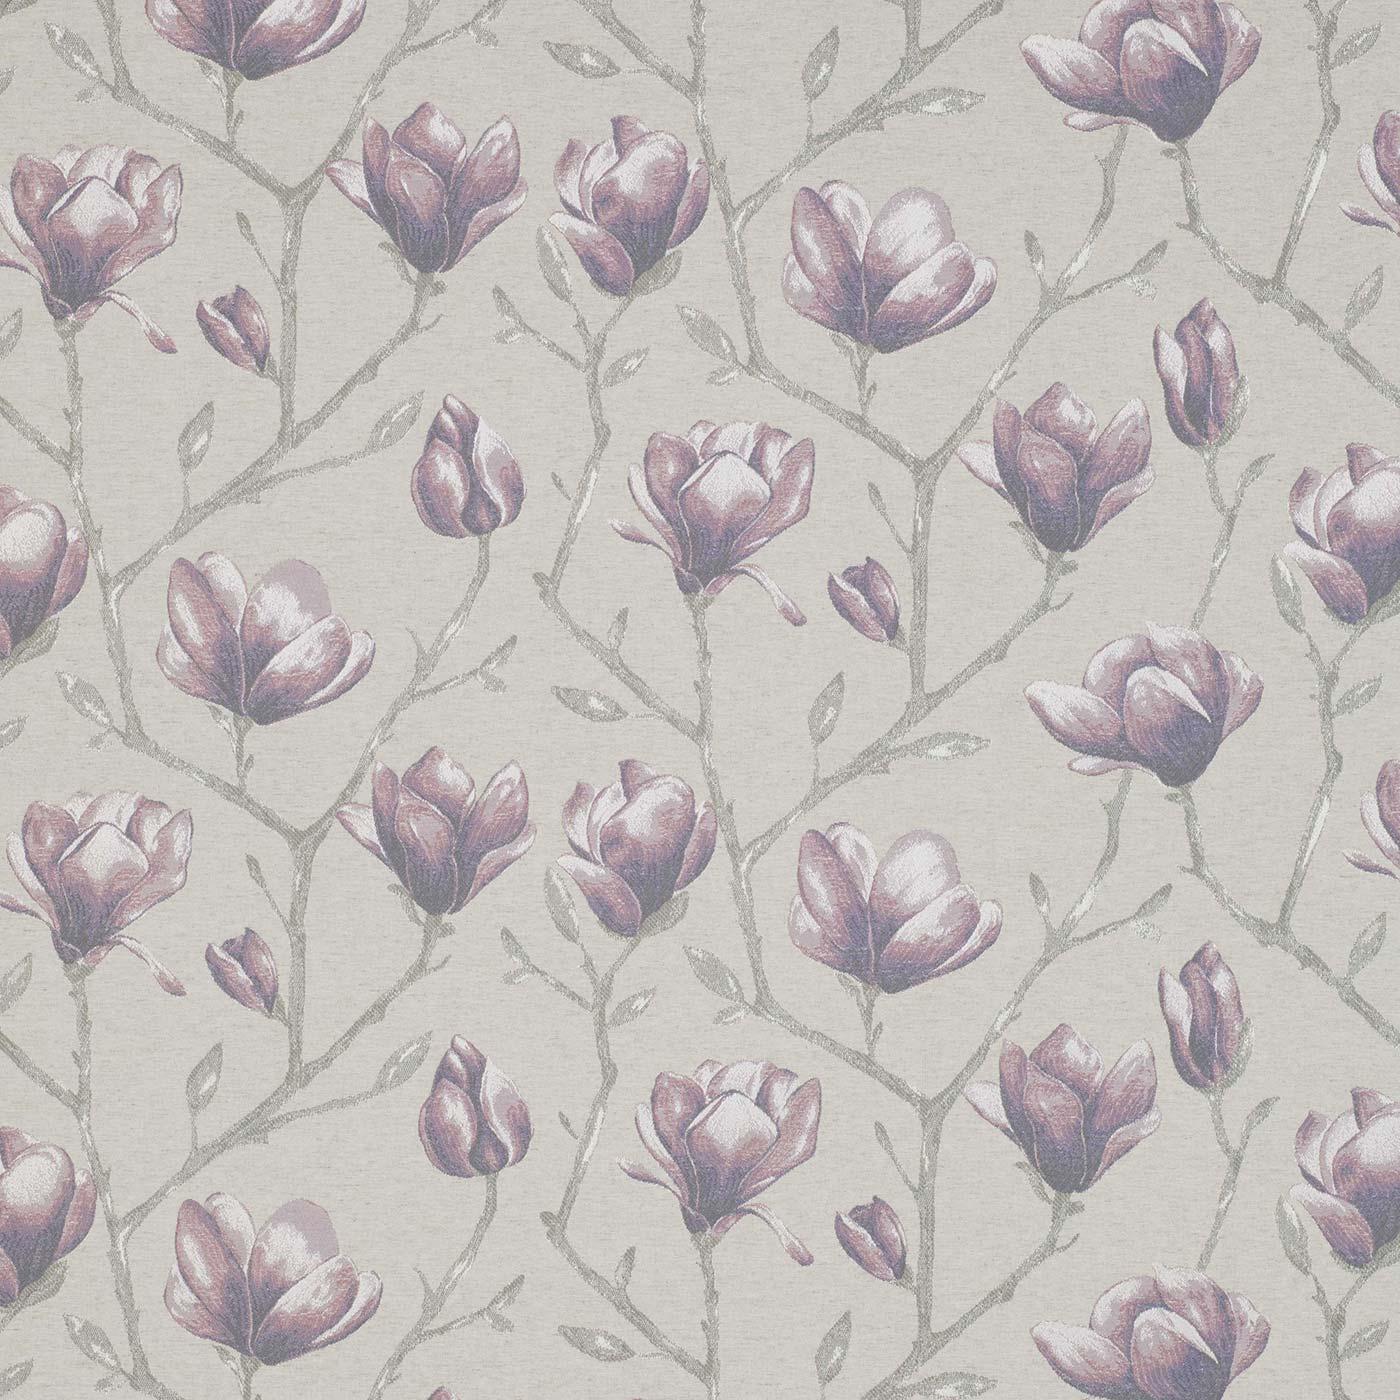 Chatsworth Fig - Sample - VOCW04